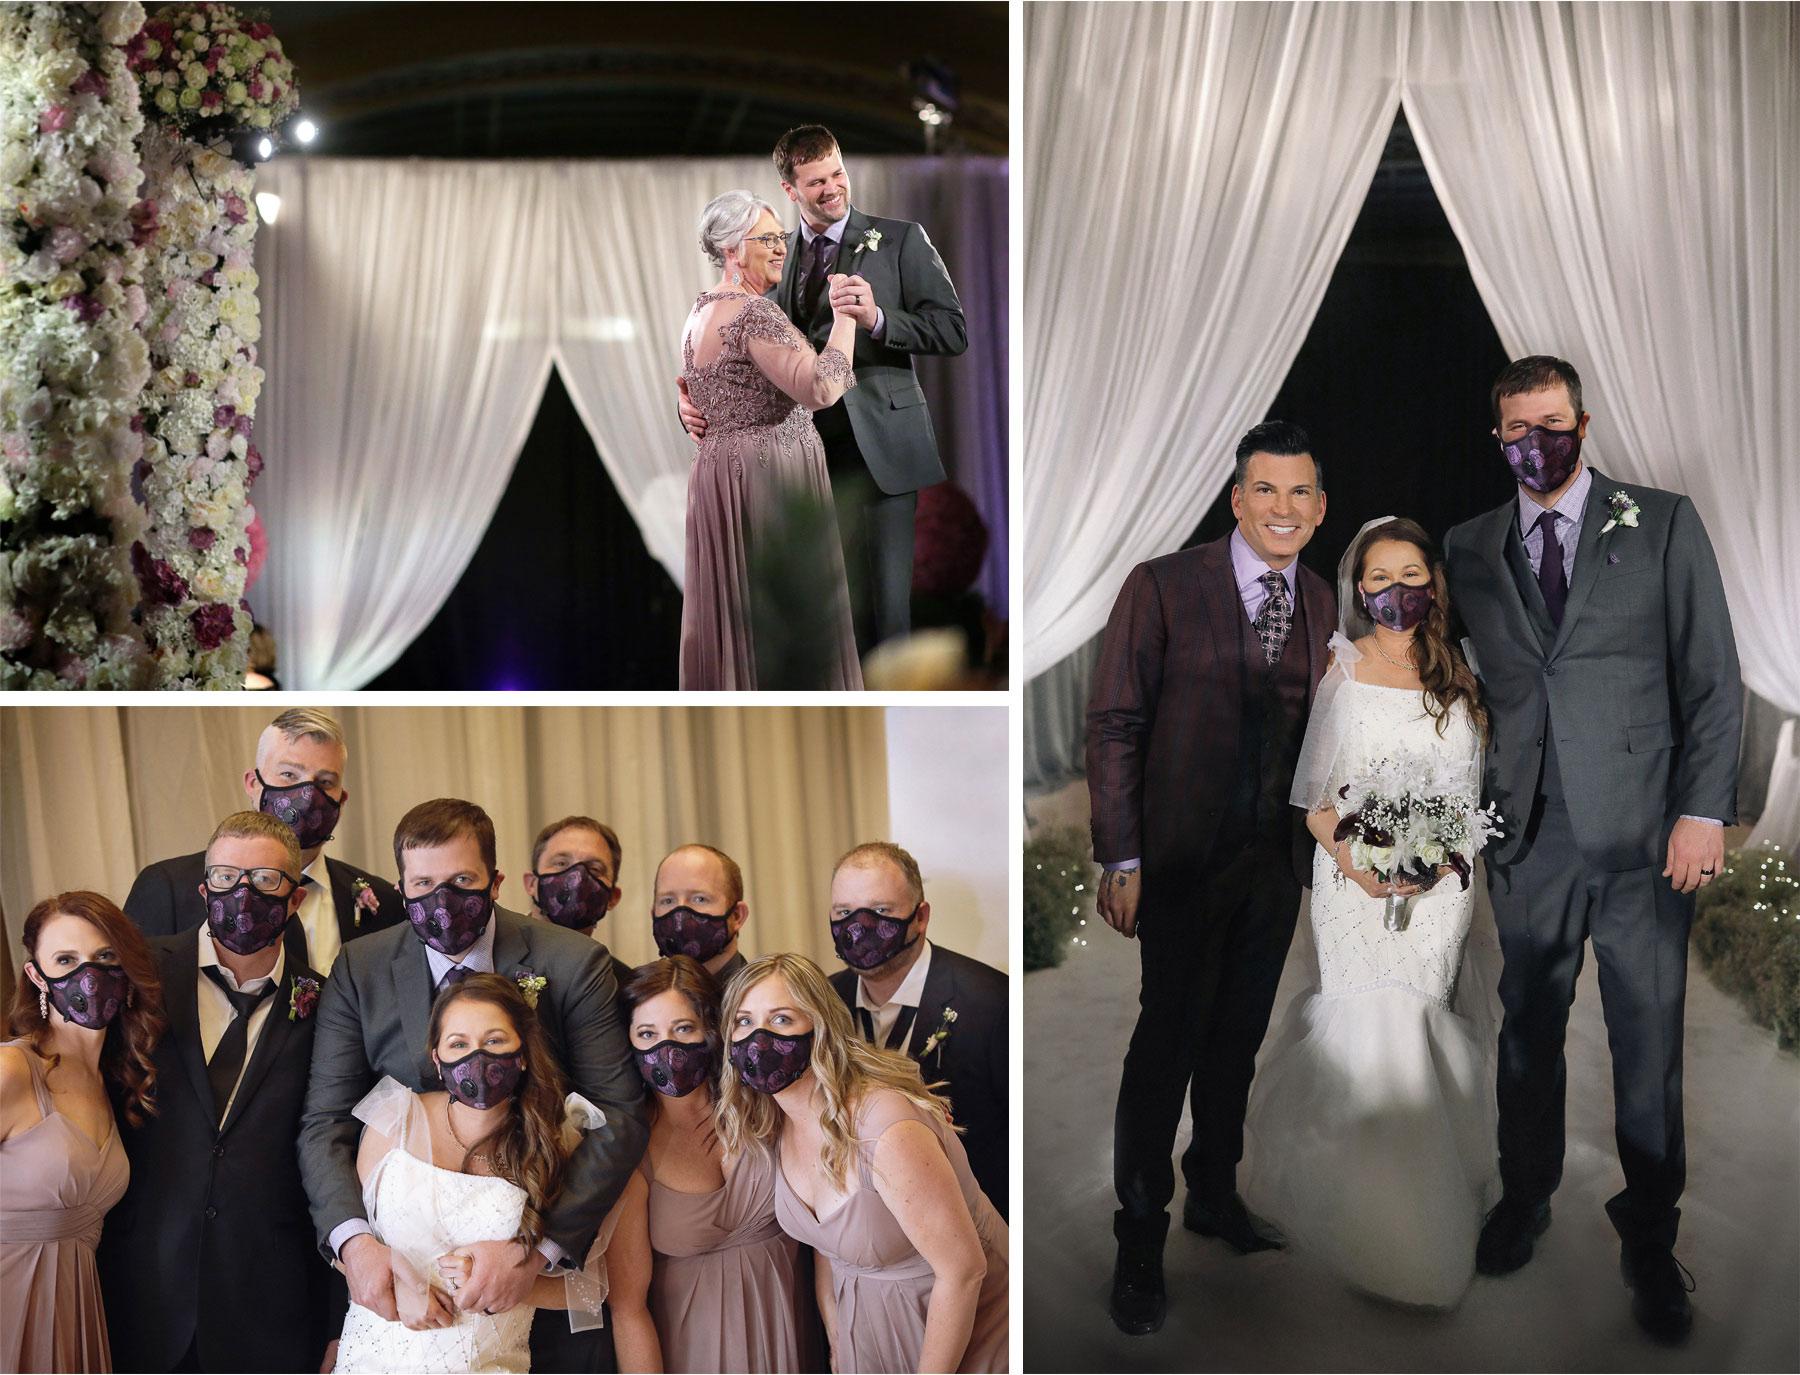 19-Saint-Paul-Minnesota-Wedding-by-Vick-Photography-Union-Depot-Lifetime-Network-David-Tutera-My-Great-Big-Live-Wedding-Cambridge-Masks-Mother-Son-Dance-Reception-Jen-and-Rob.jpg